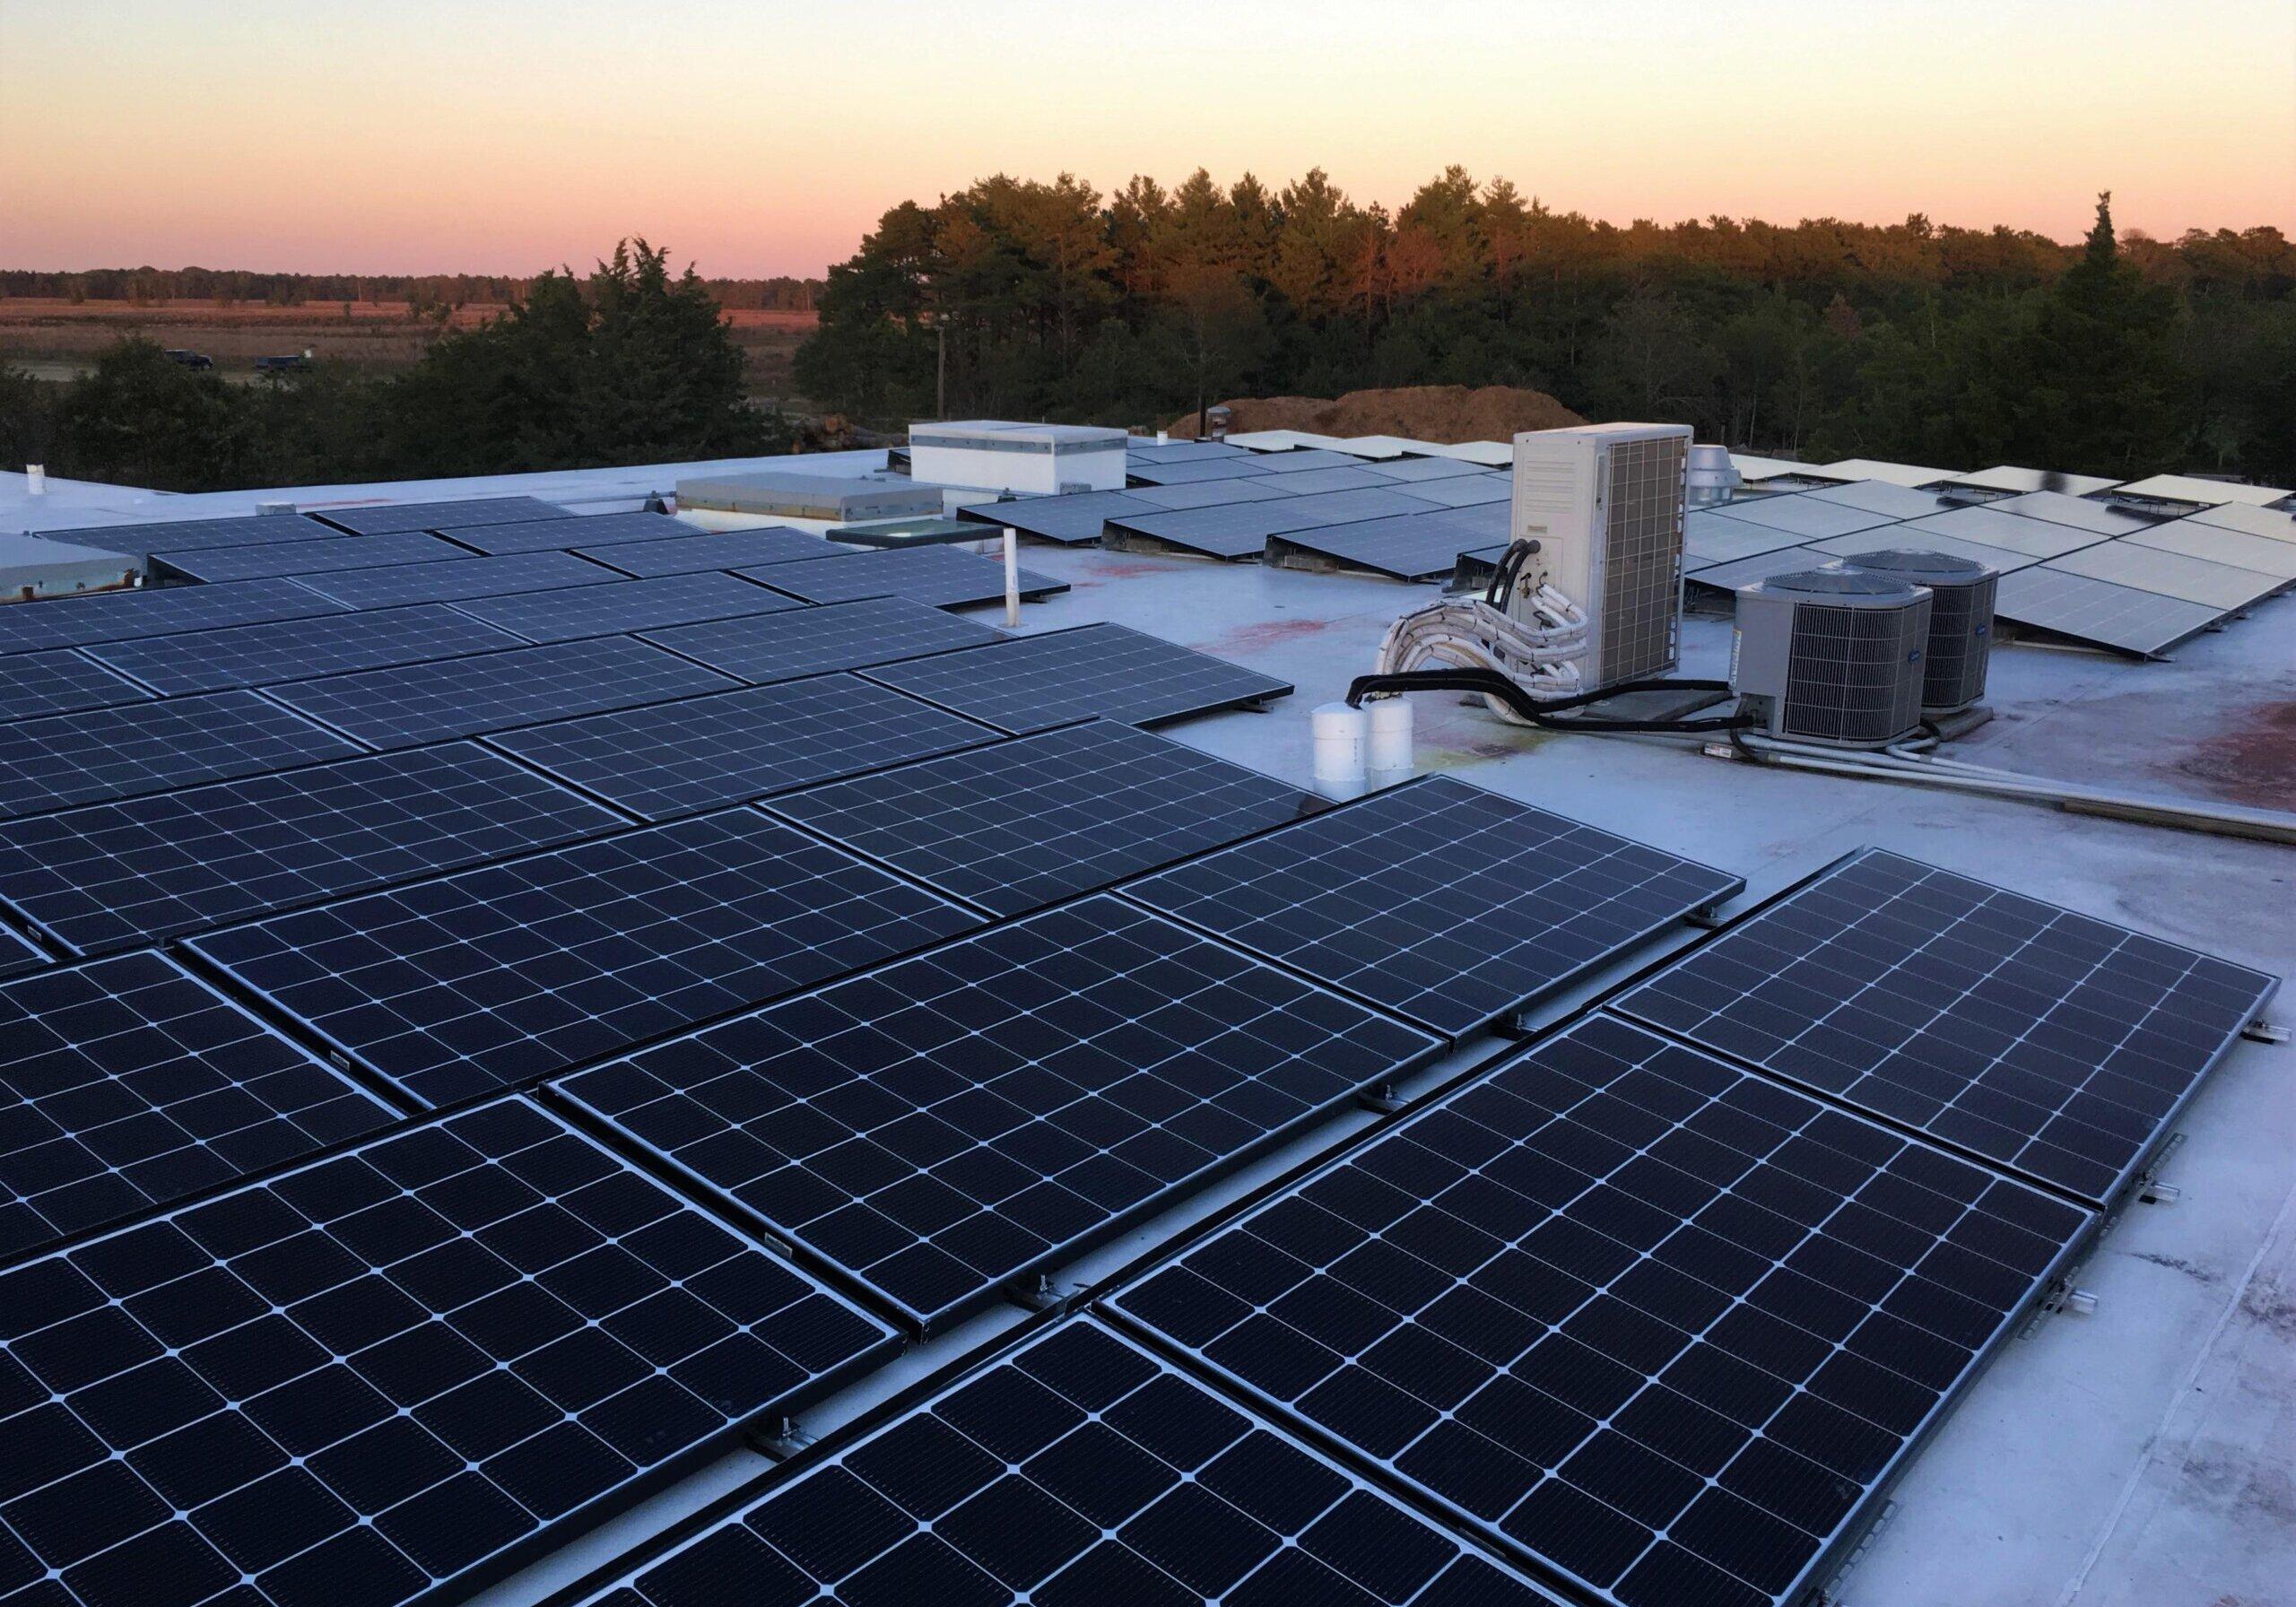 Falmouth Cape Cod Commercial Solar